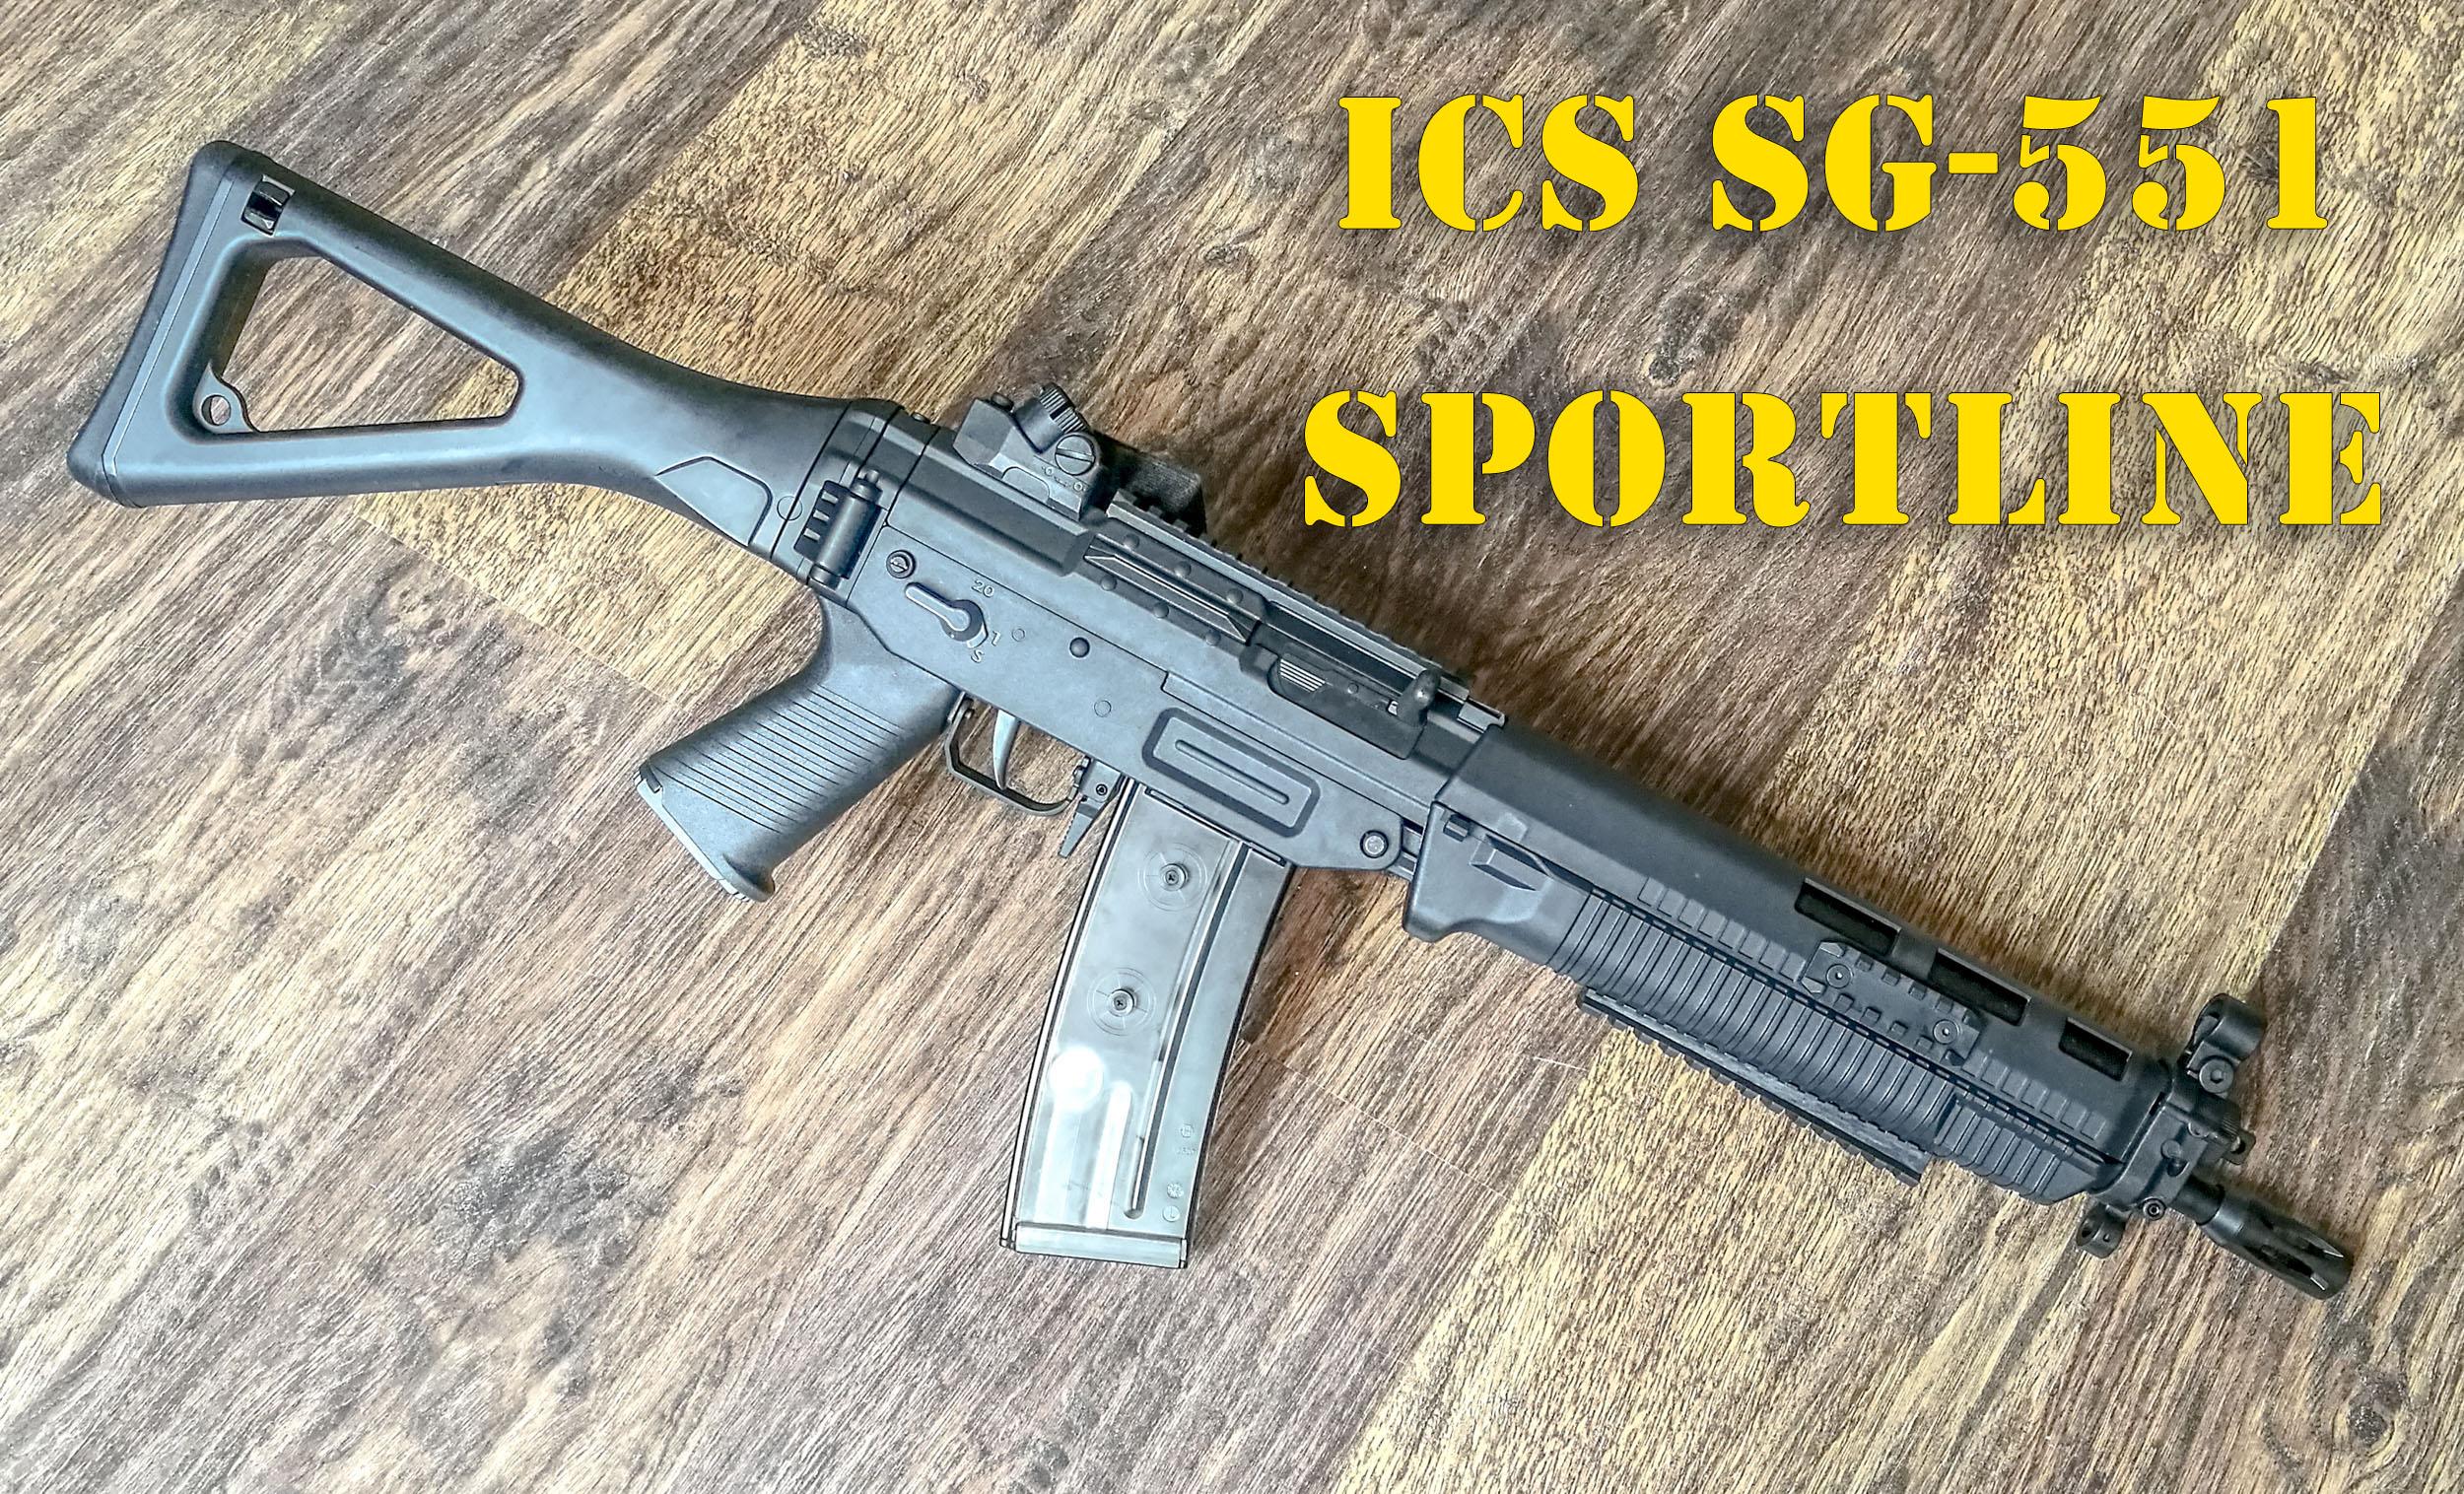 icssgsport551.jpg